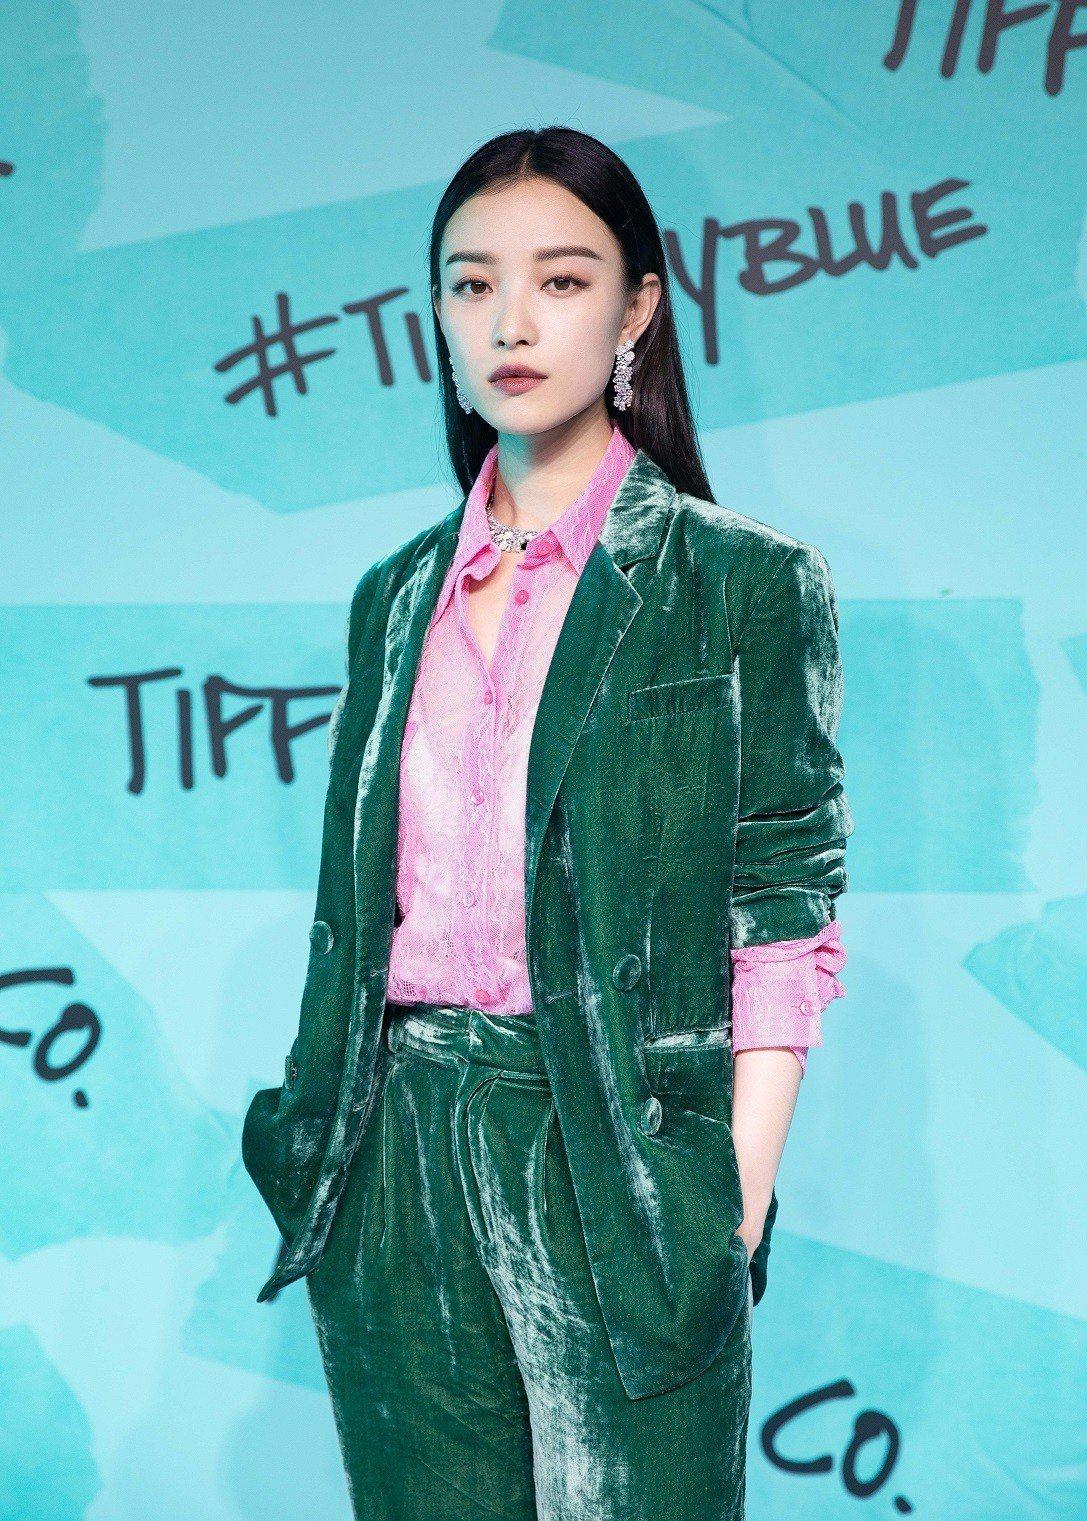 Tiffany品牌代言人倪妮配戴全新的Tiffany Paper Flowers...